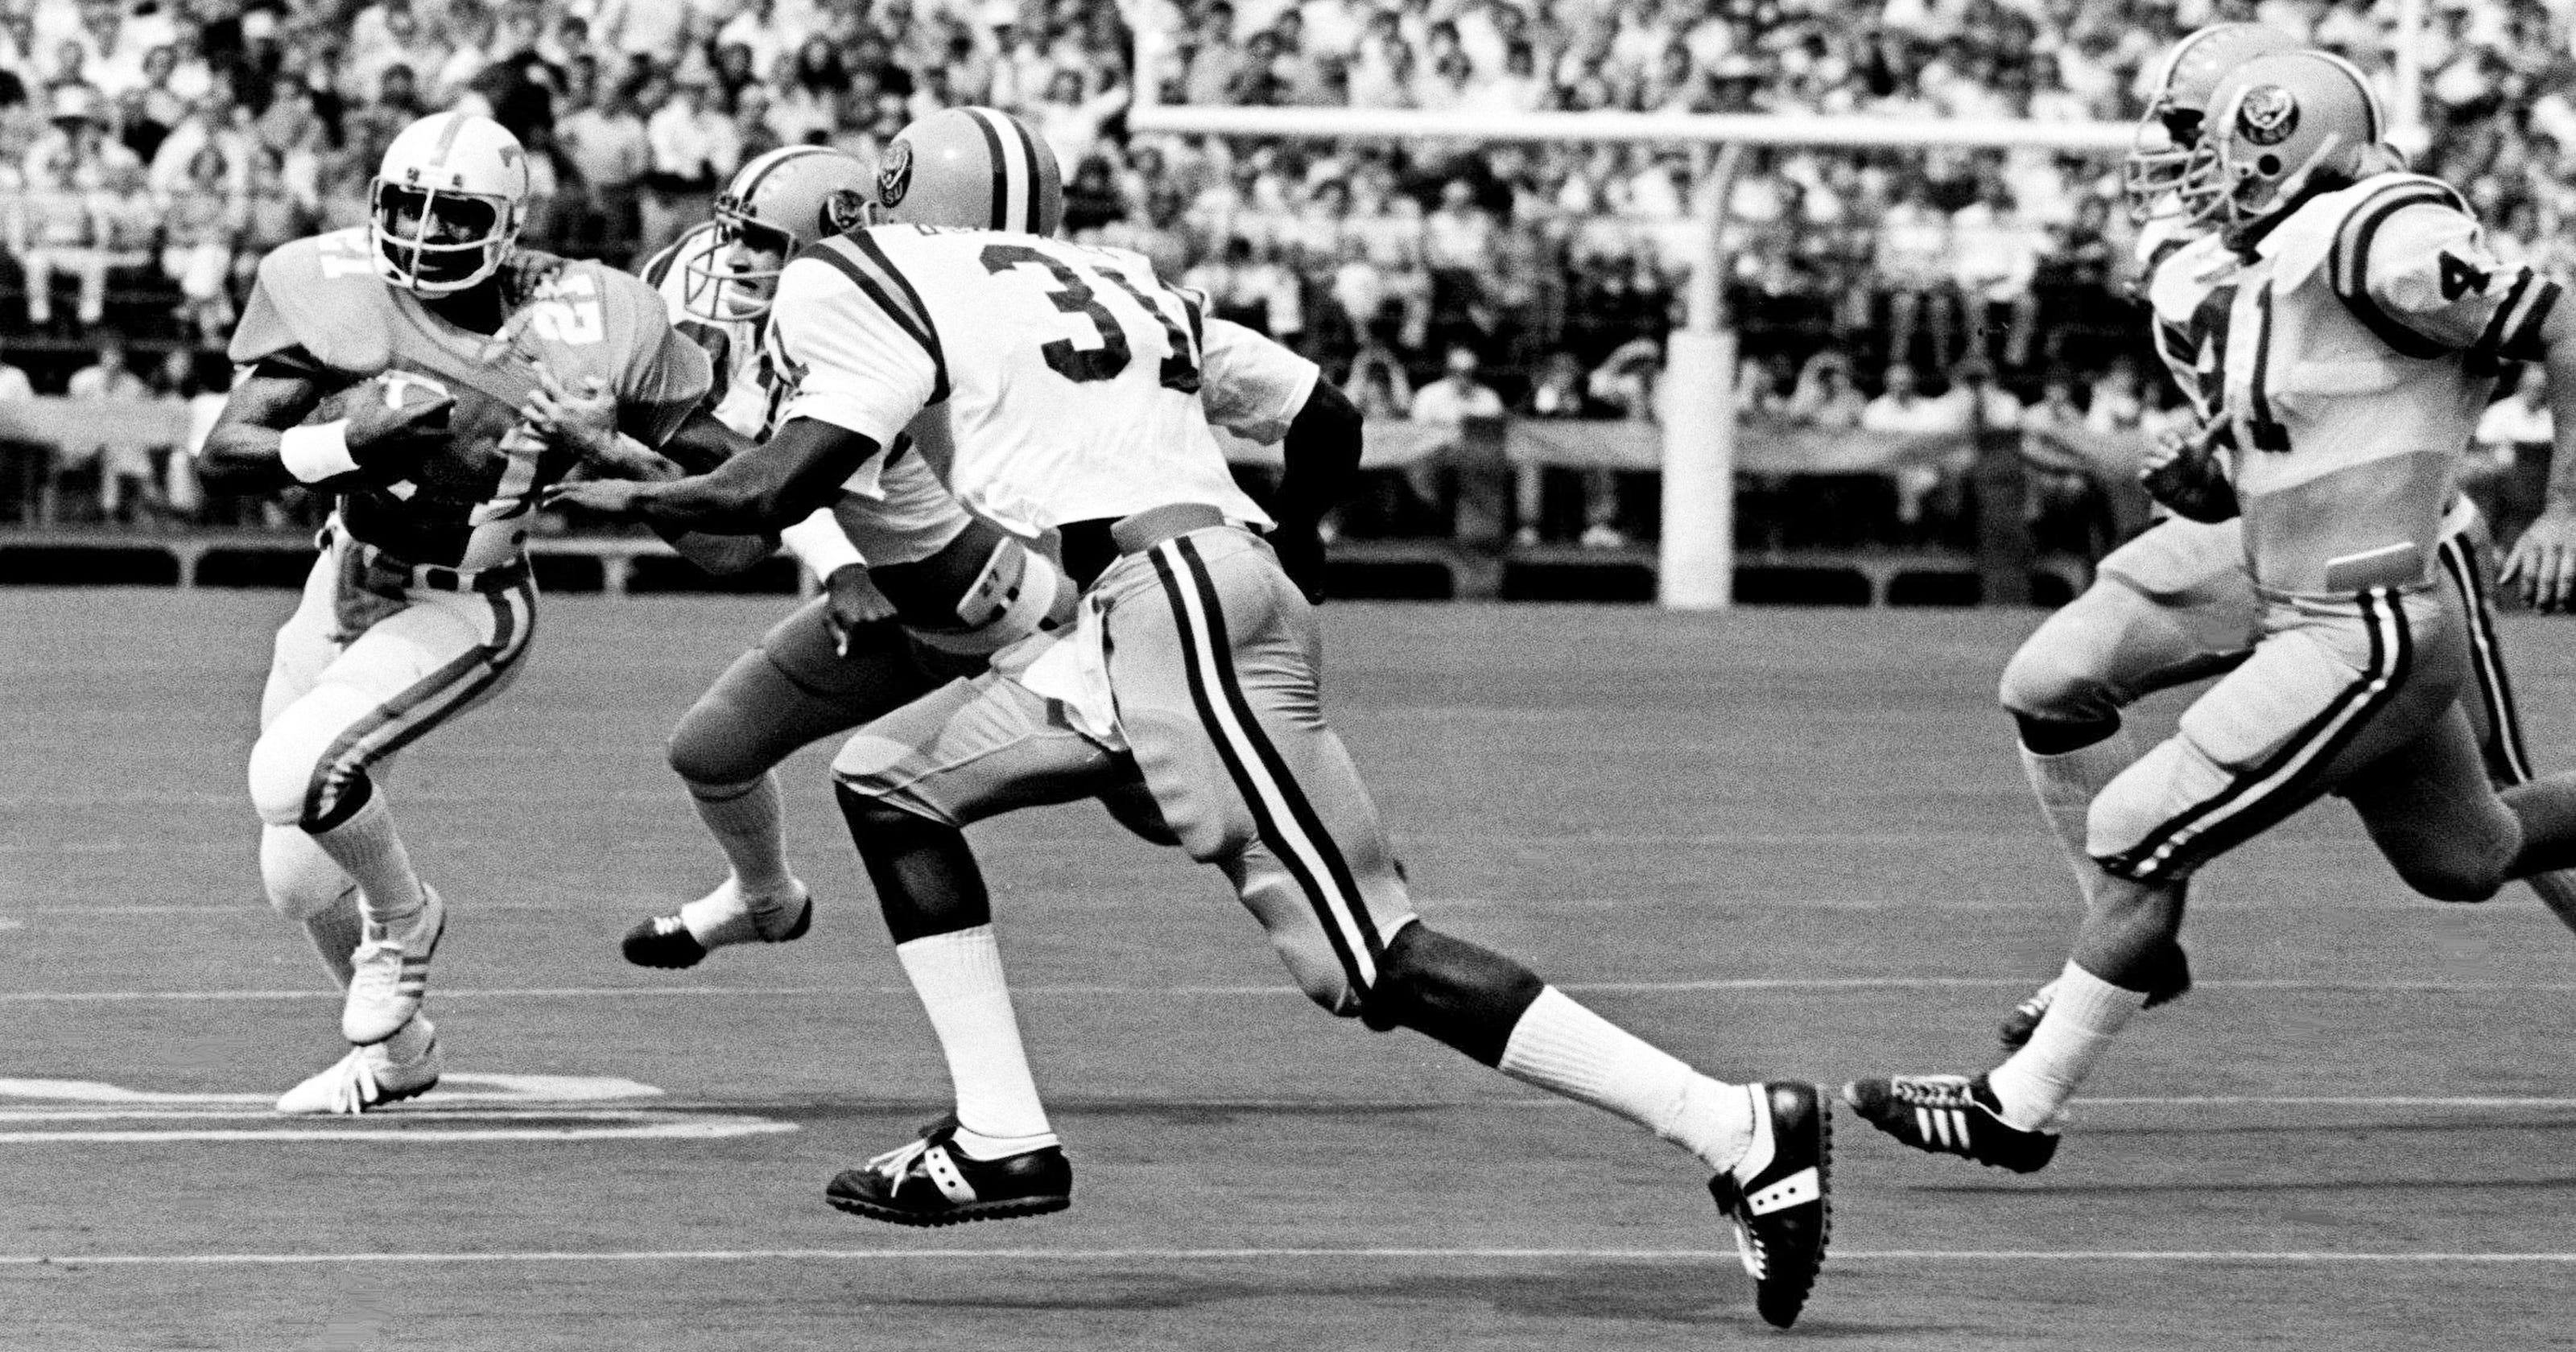 Nashville Then: Tennessee vs. LSU in 1975